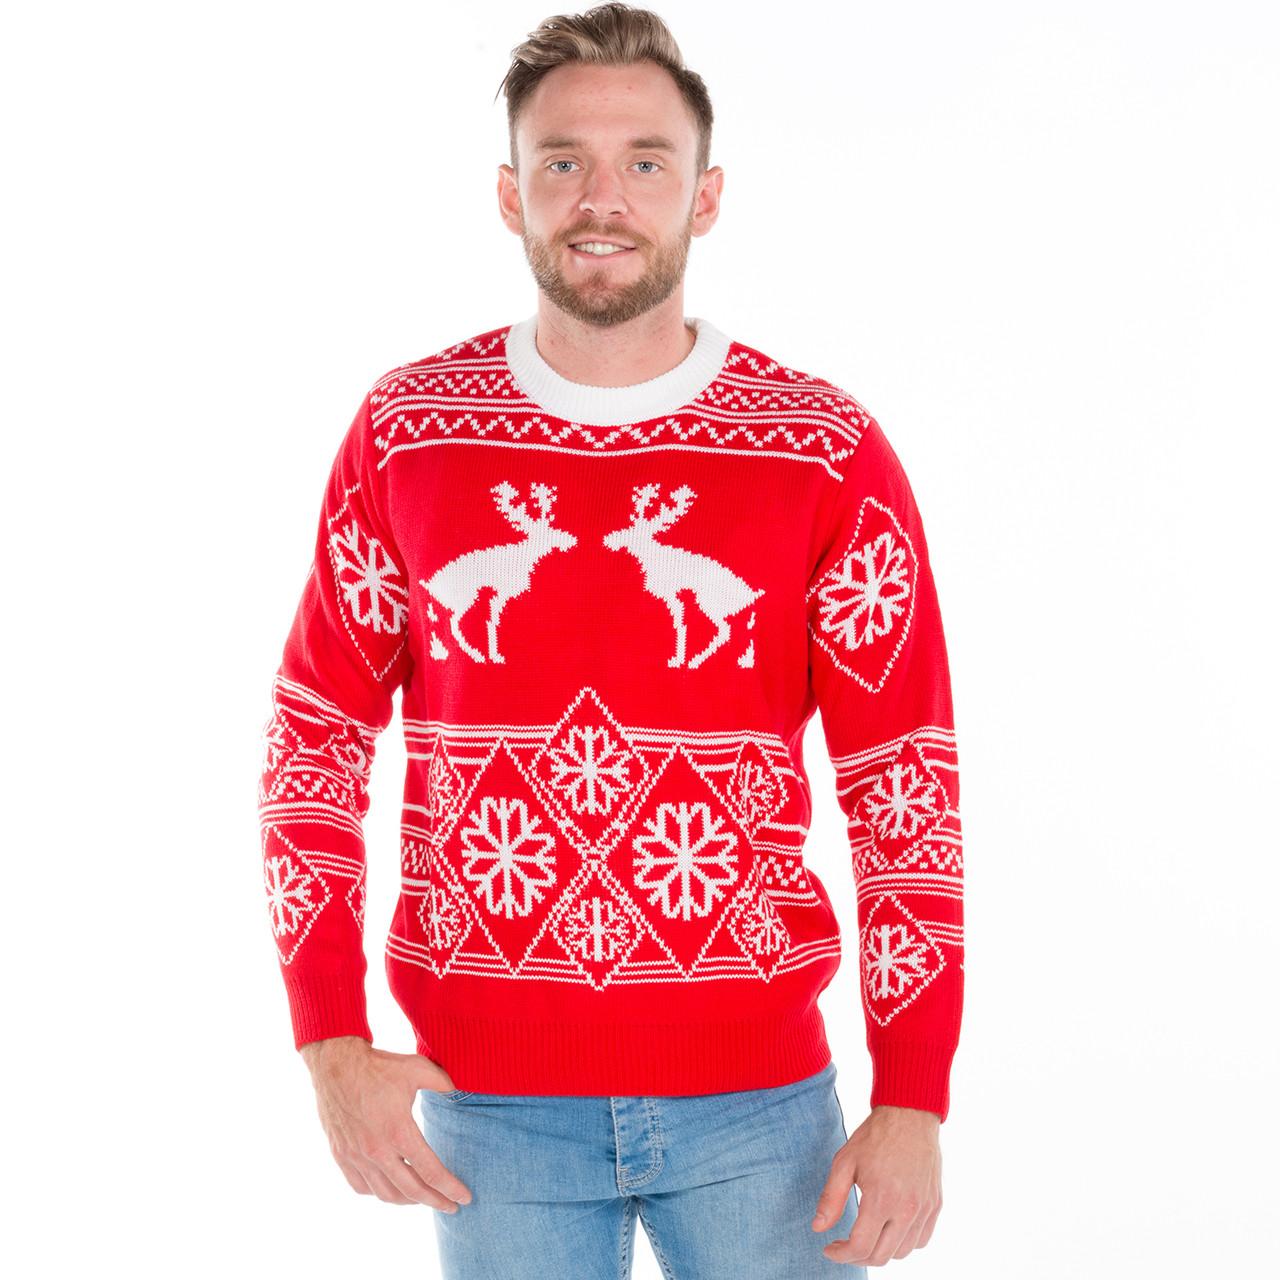 Moose christmas sweater